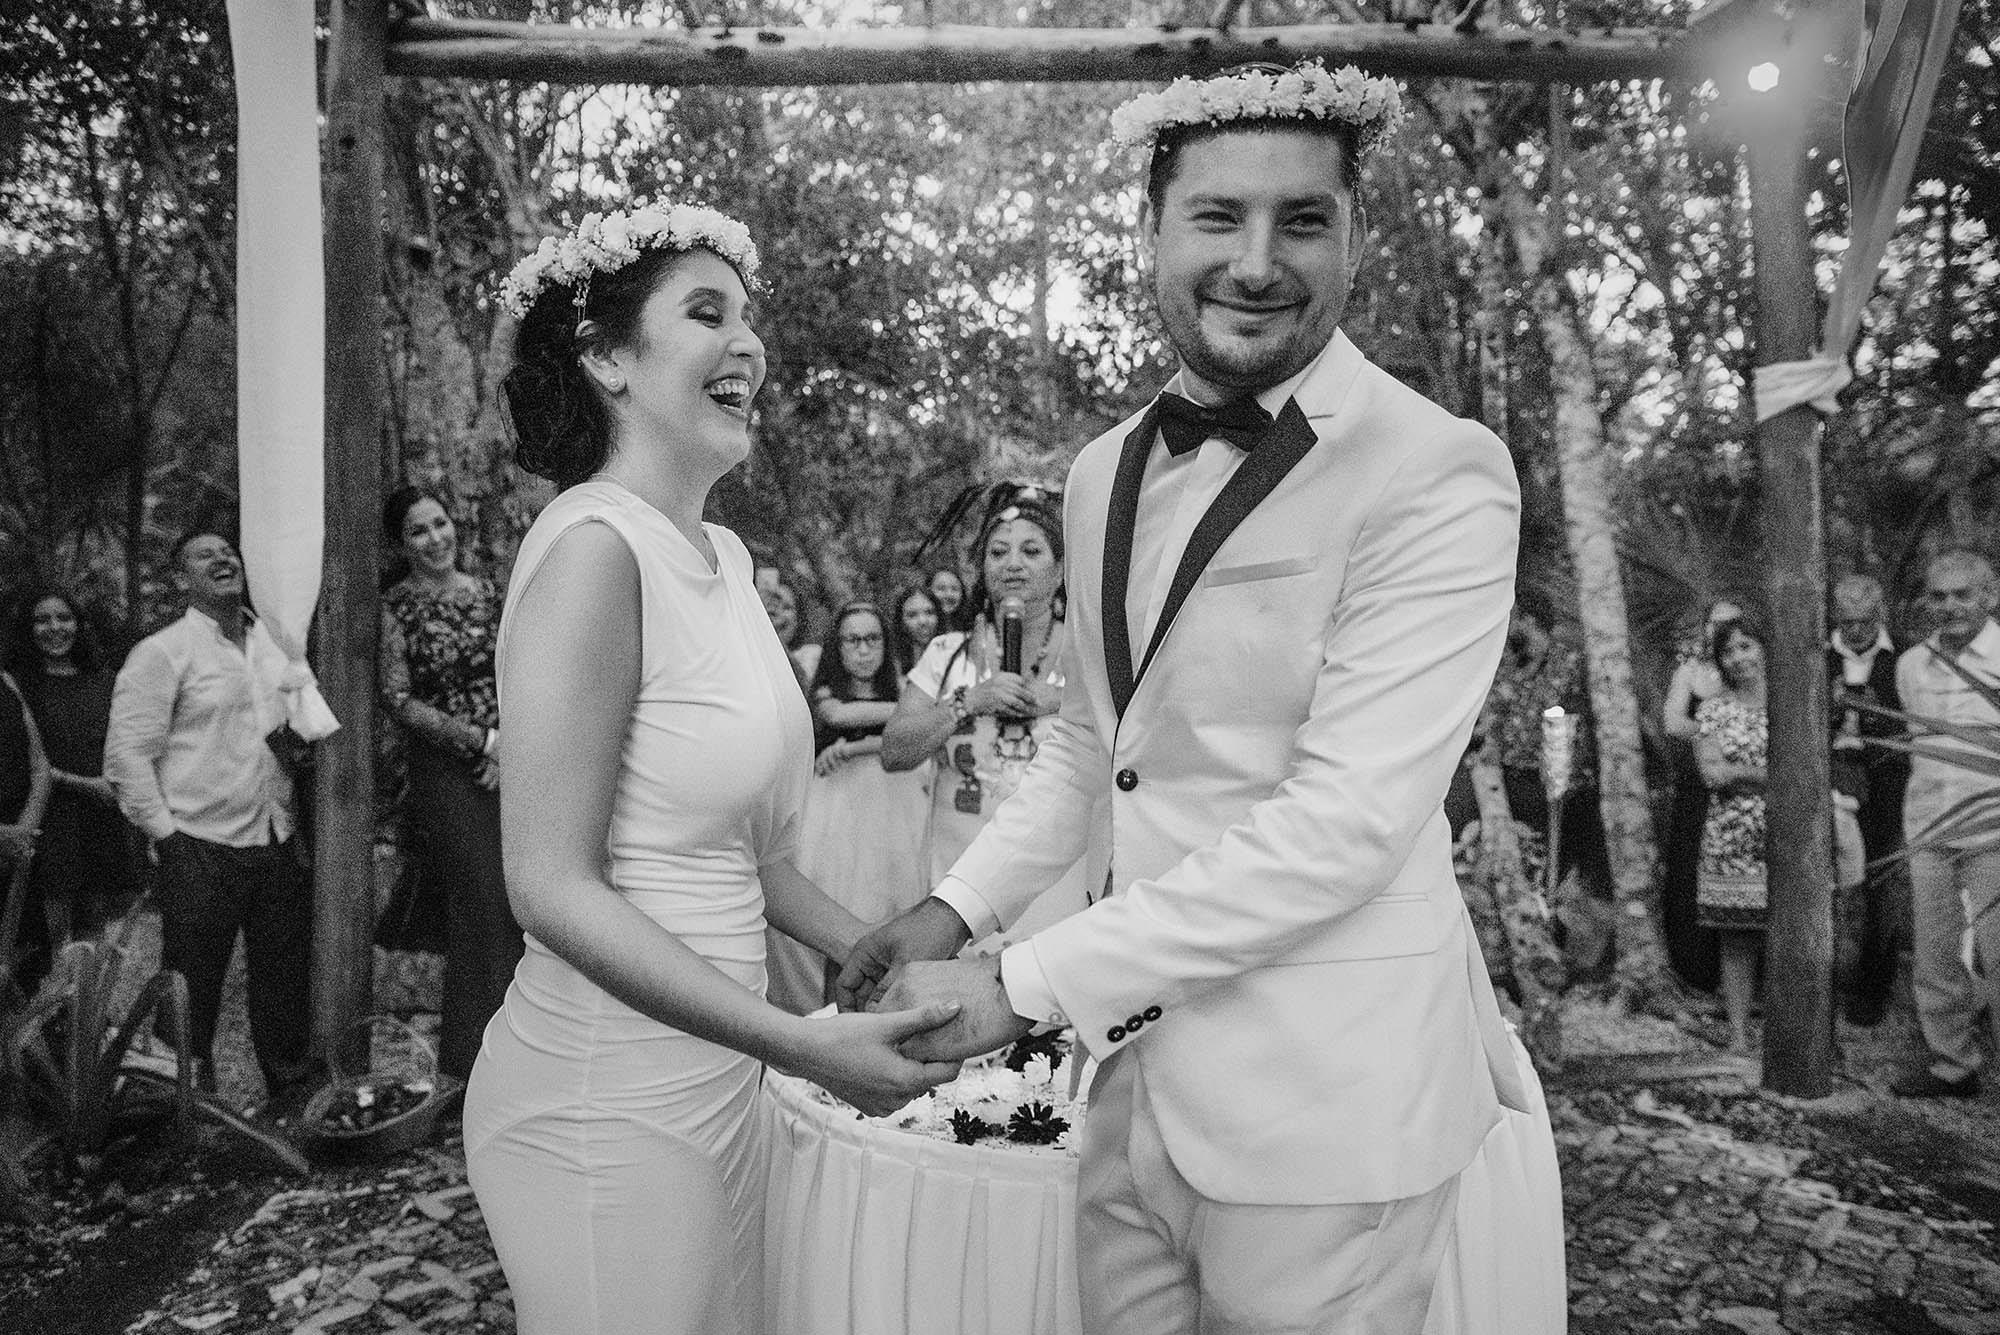 Wedding playa del carmen planner destination mexico magali espinosa41-WEB.jpg